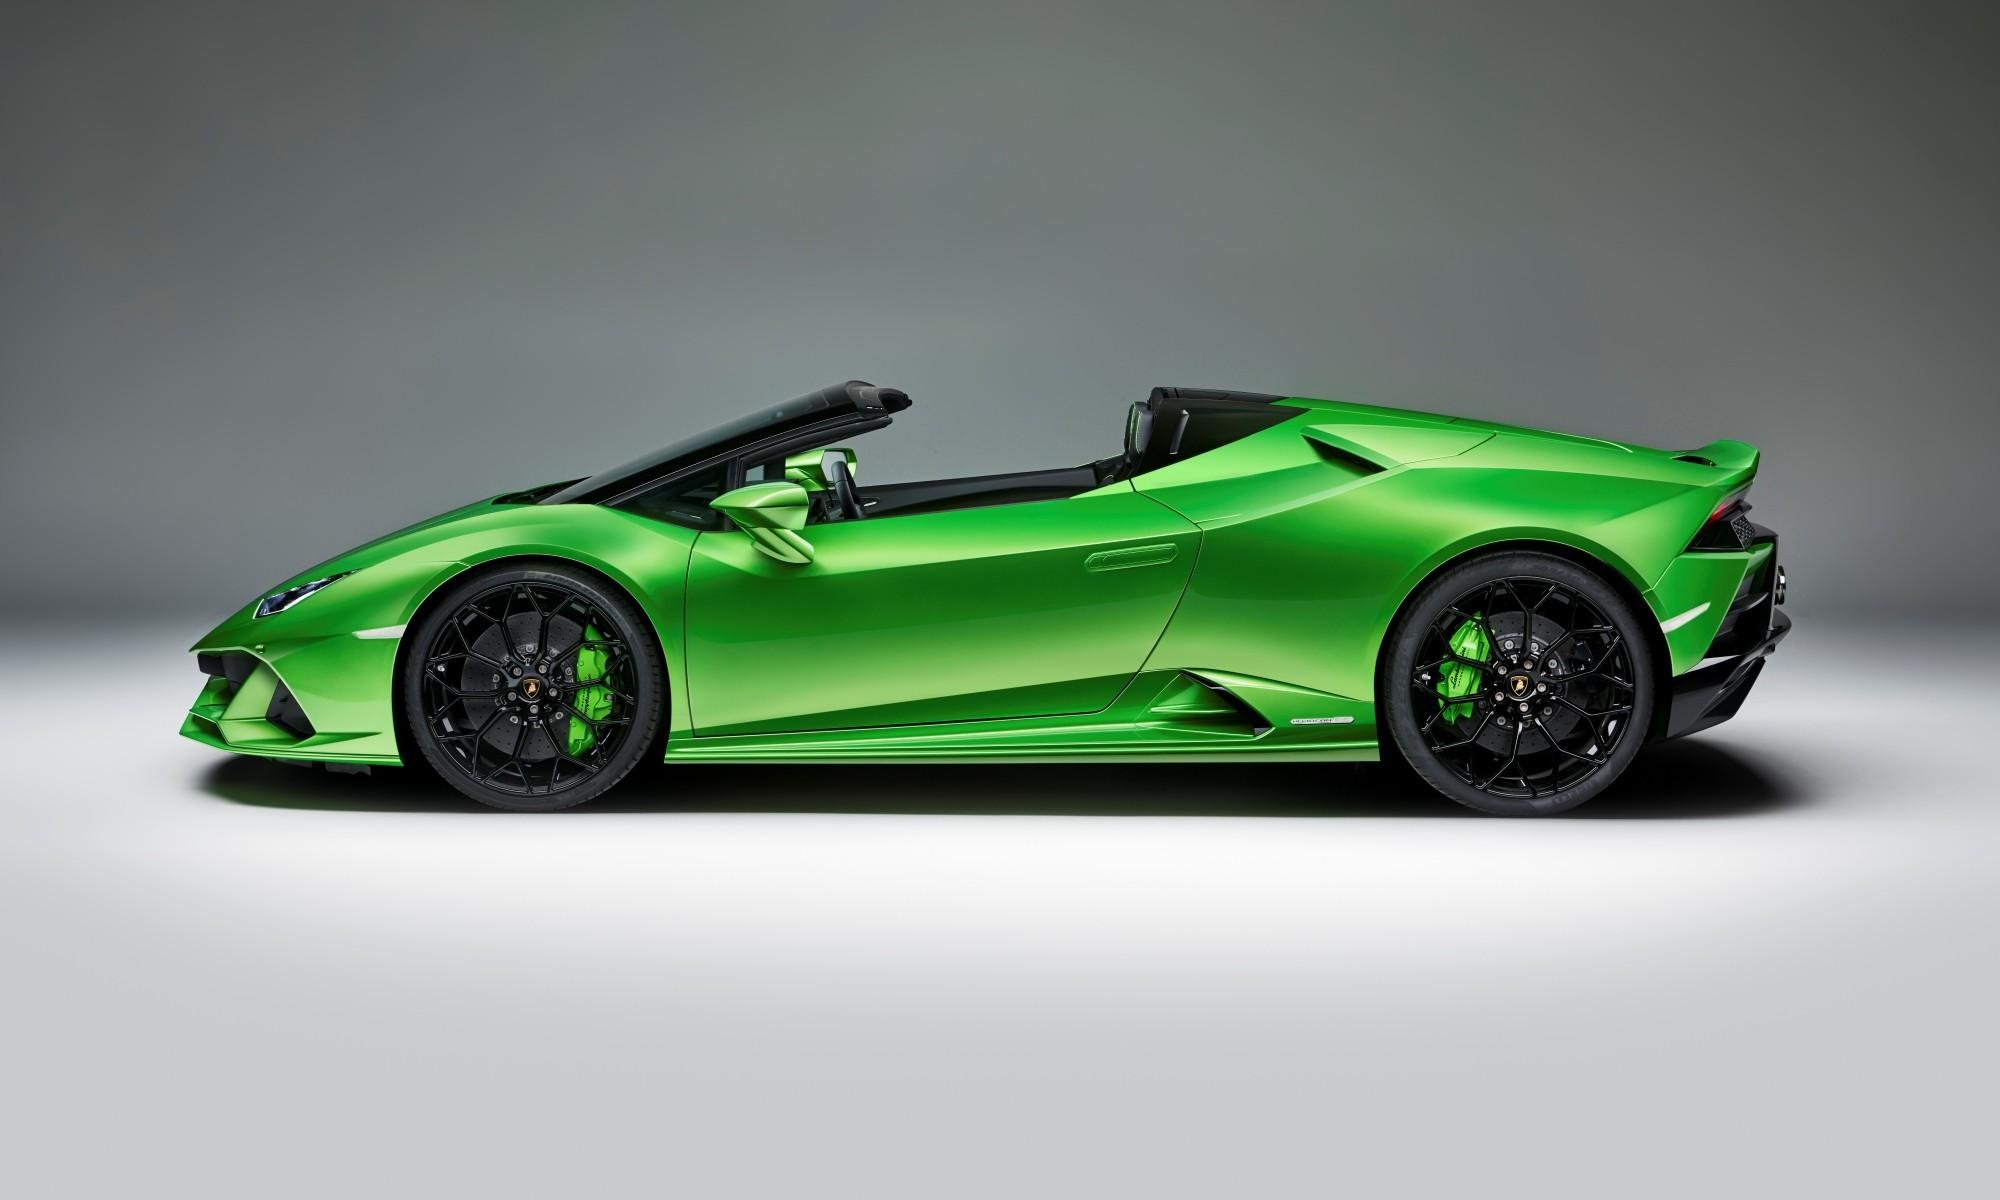 Lamborghini Huracan Evo Spyder profile